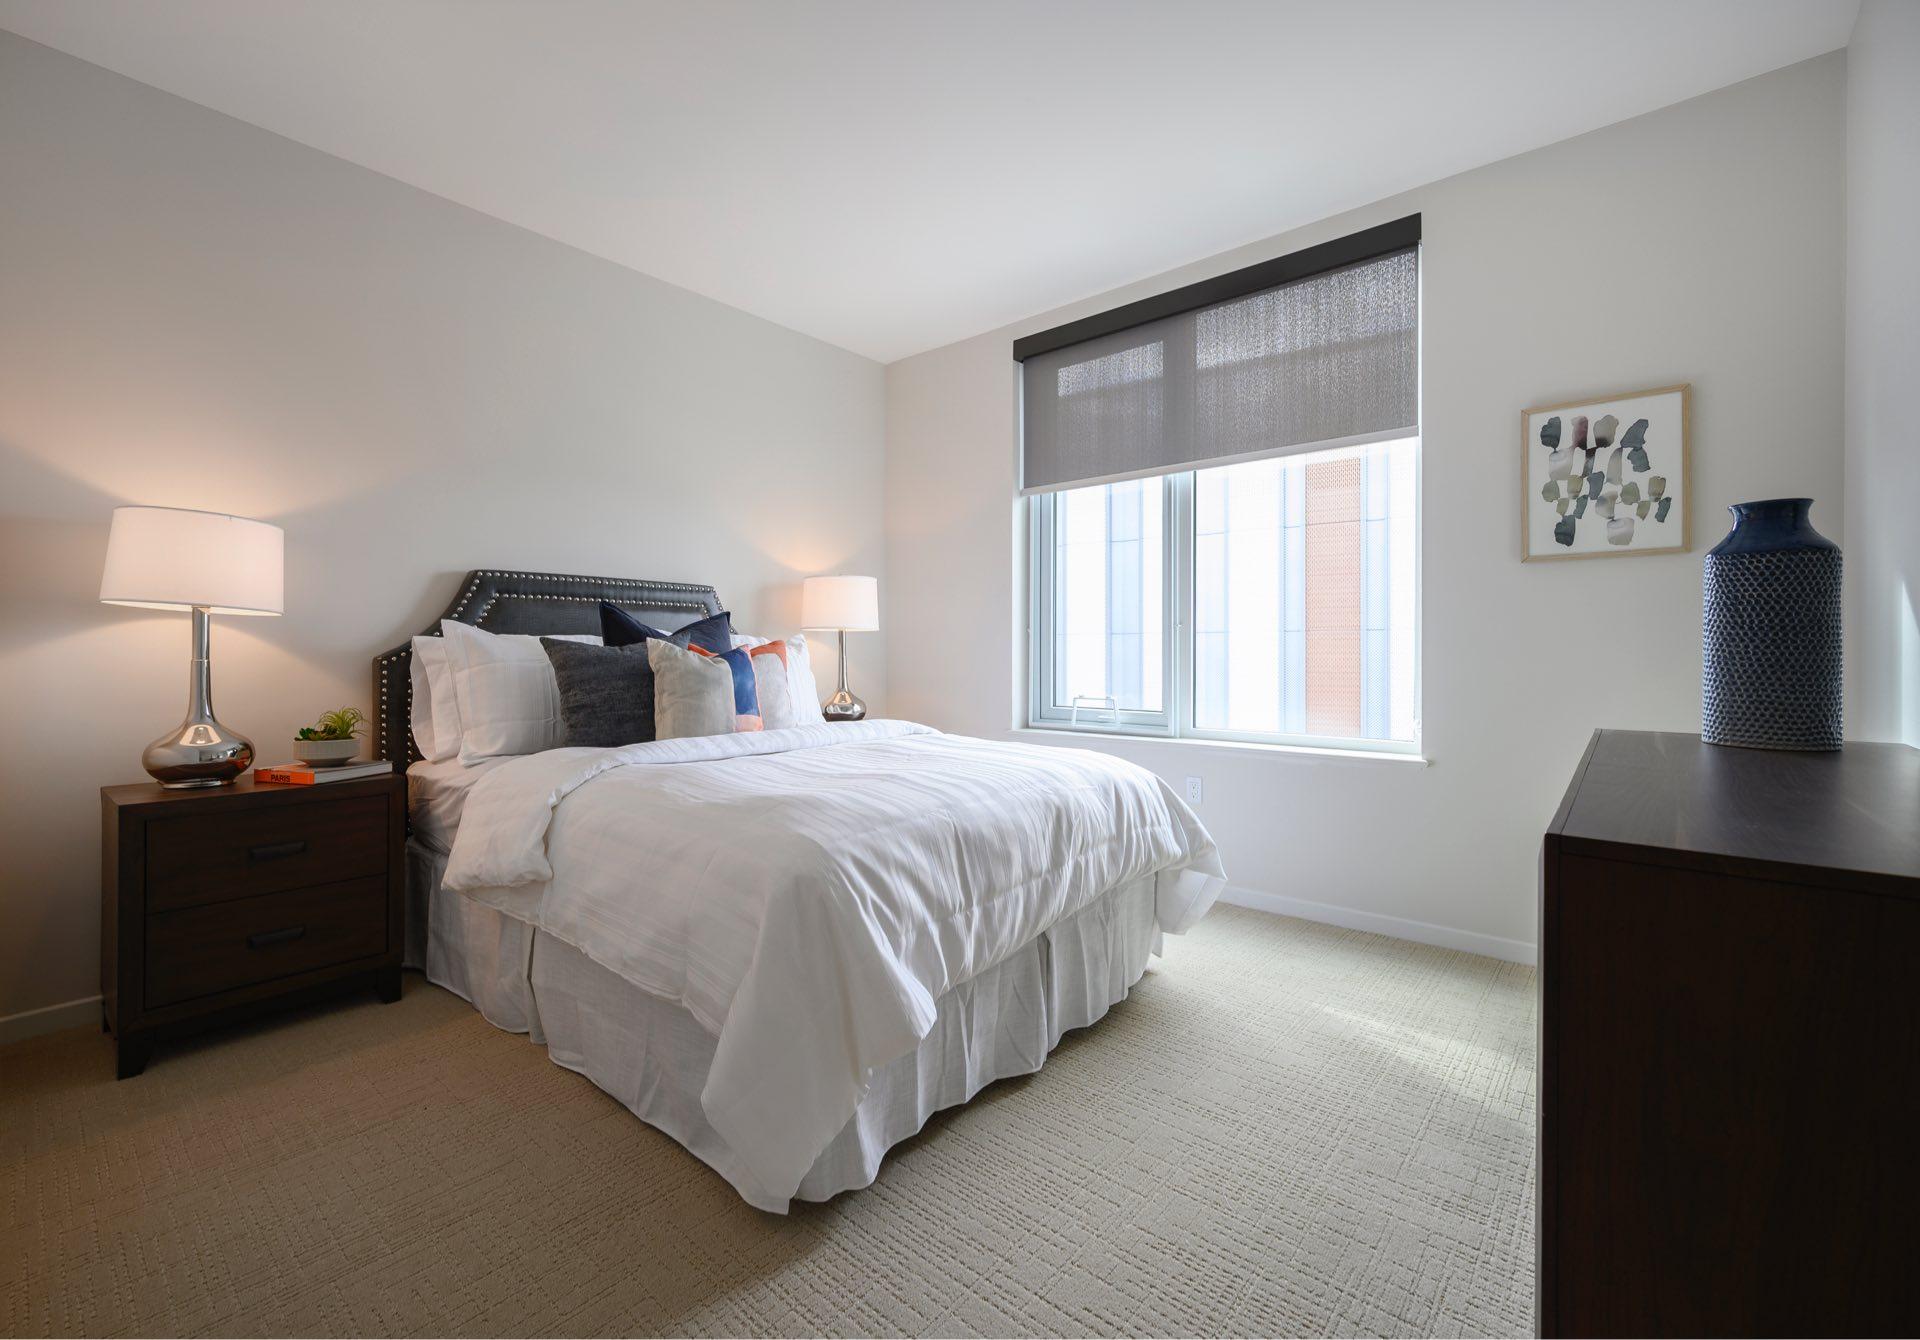 Apartments img 32